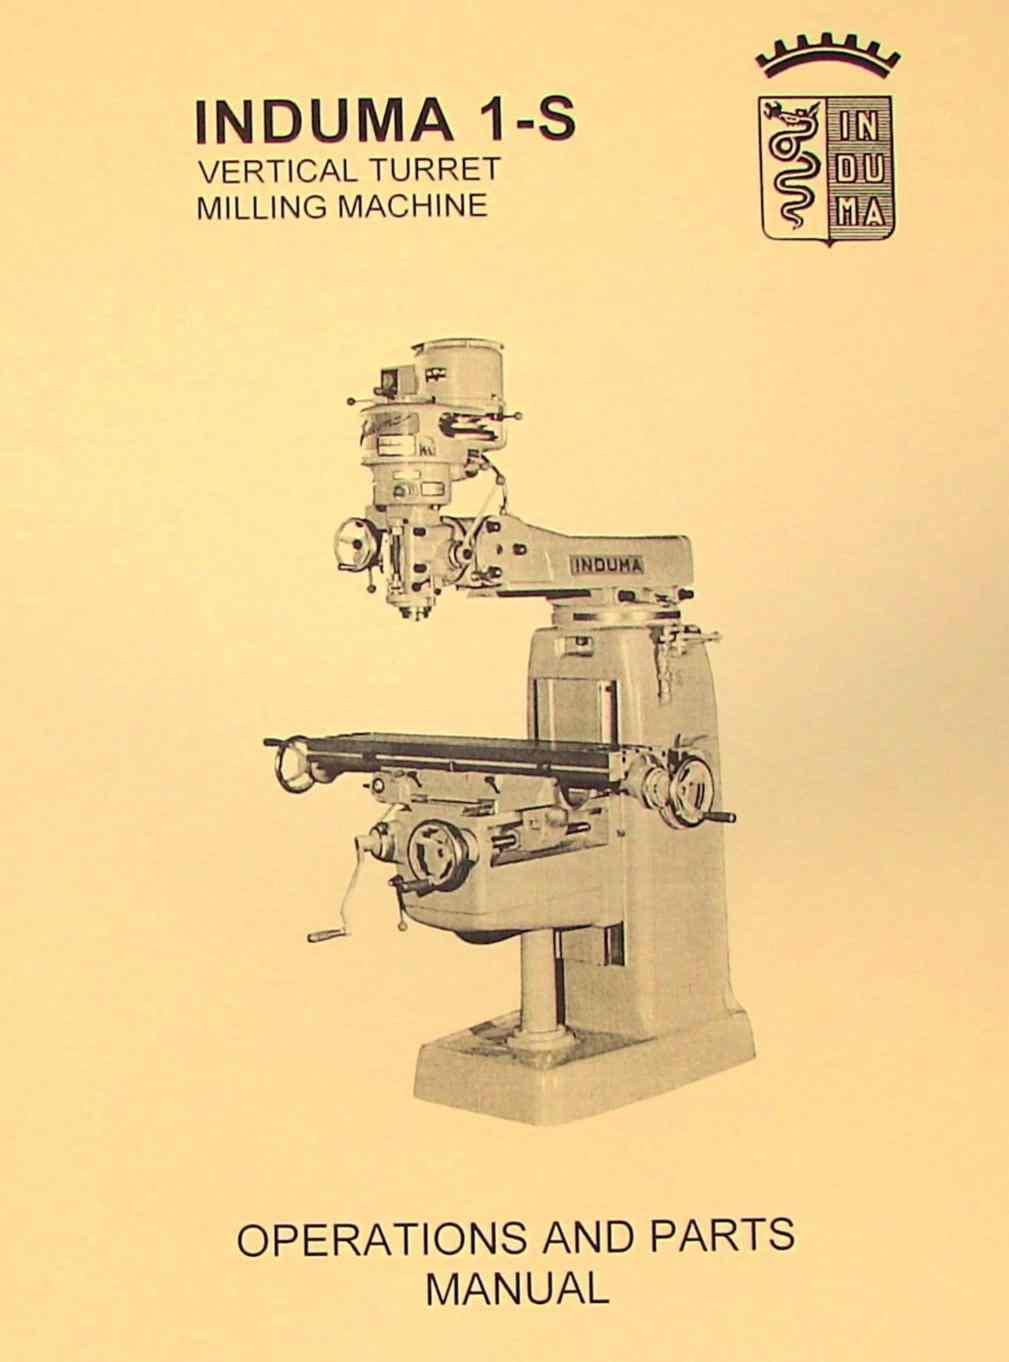 Wilton Milling Machine Repair Manual Vise Parts Diagram Induma 1 S Vertical Turret Ozark Tool Rh Ozarktoolmanuals Com